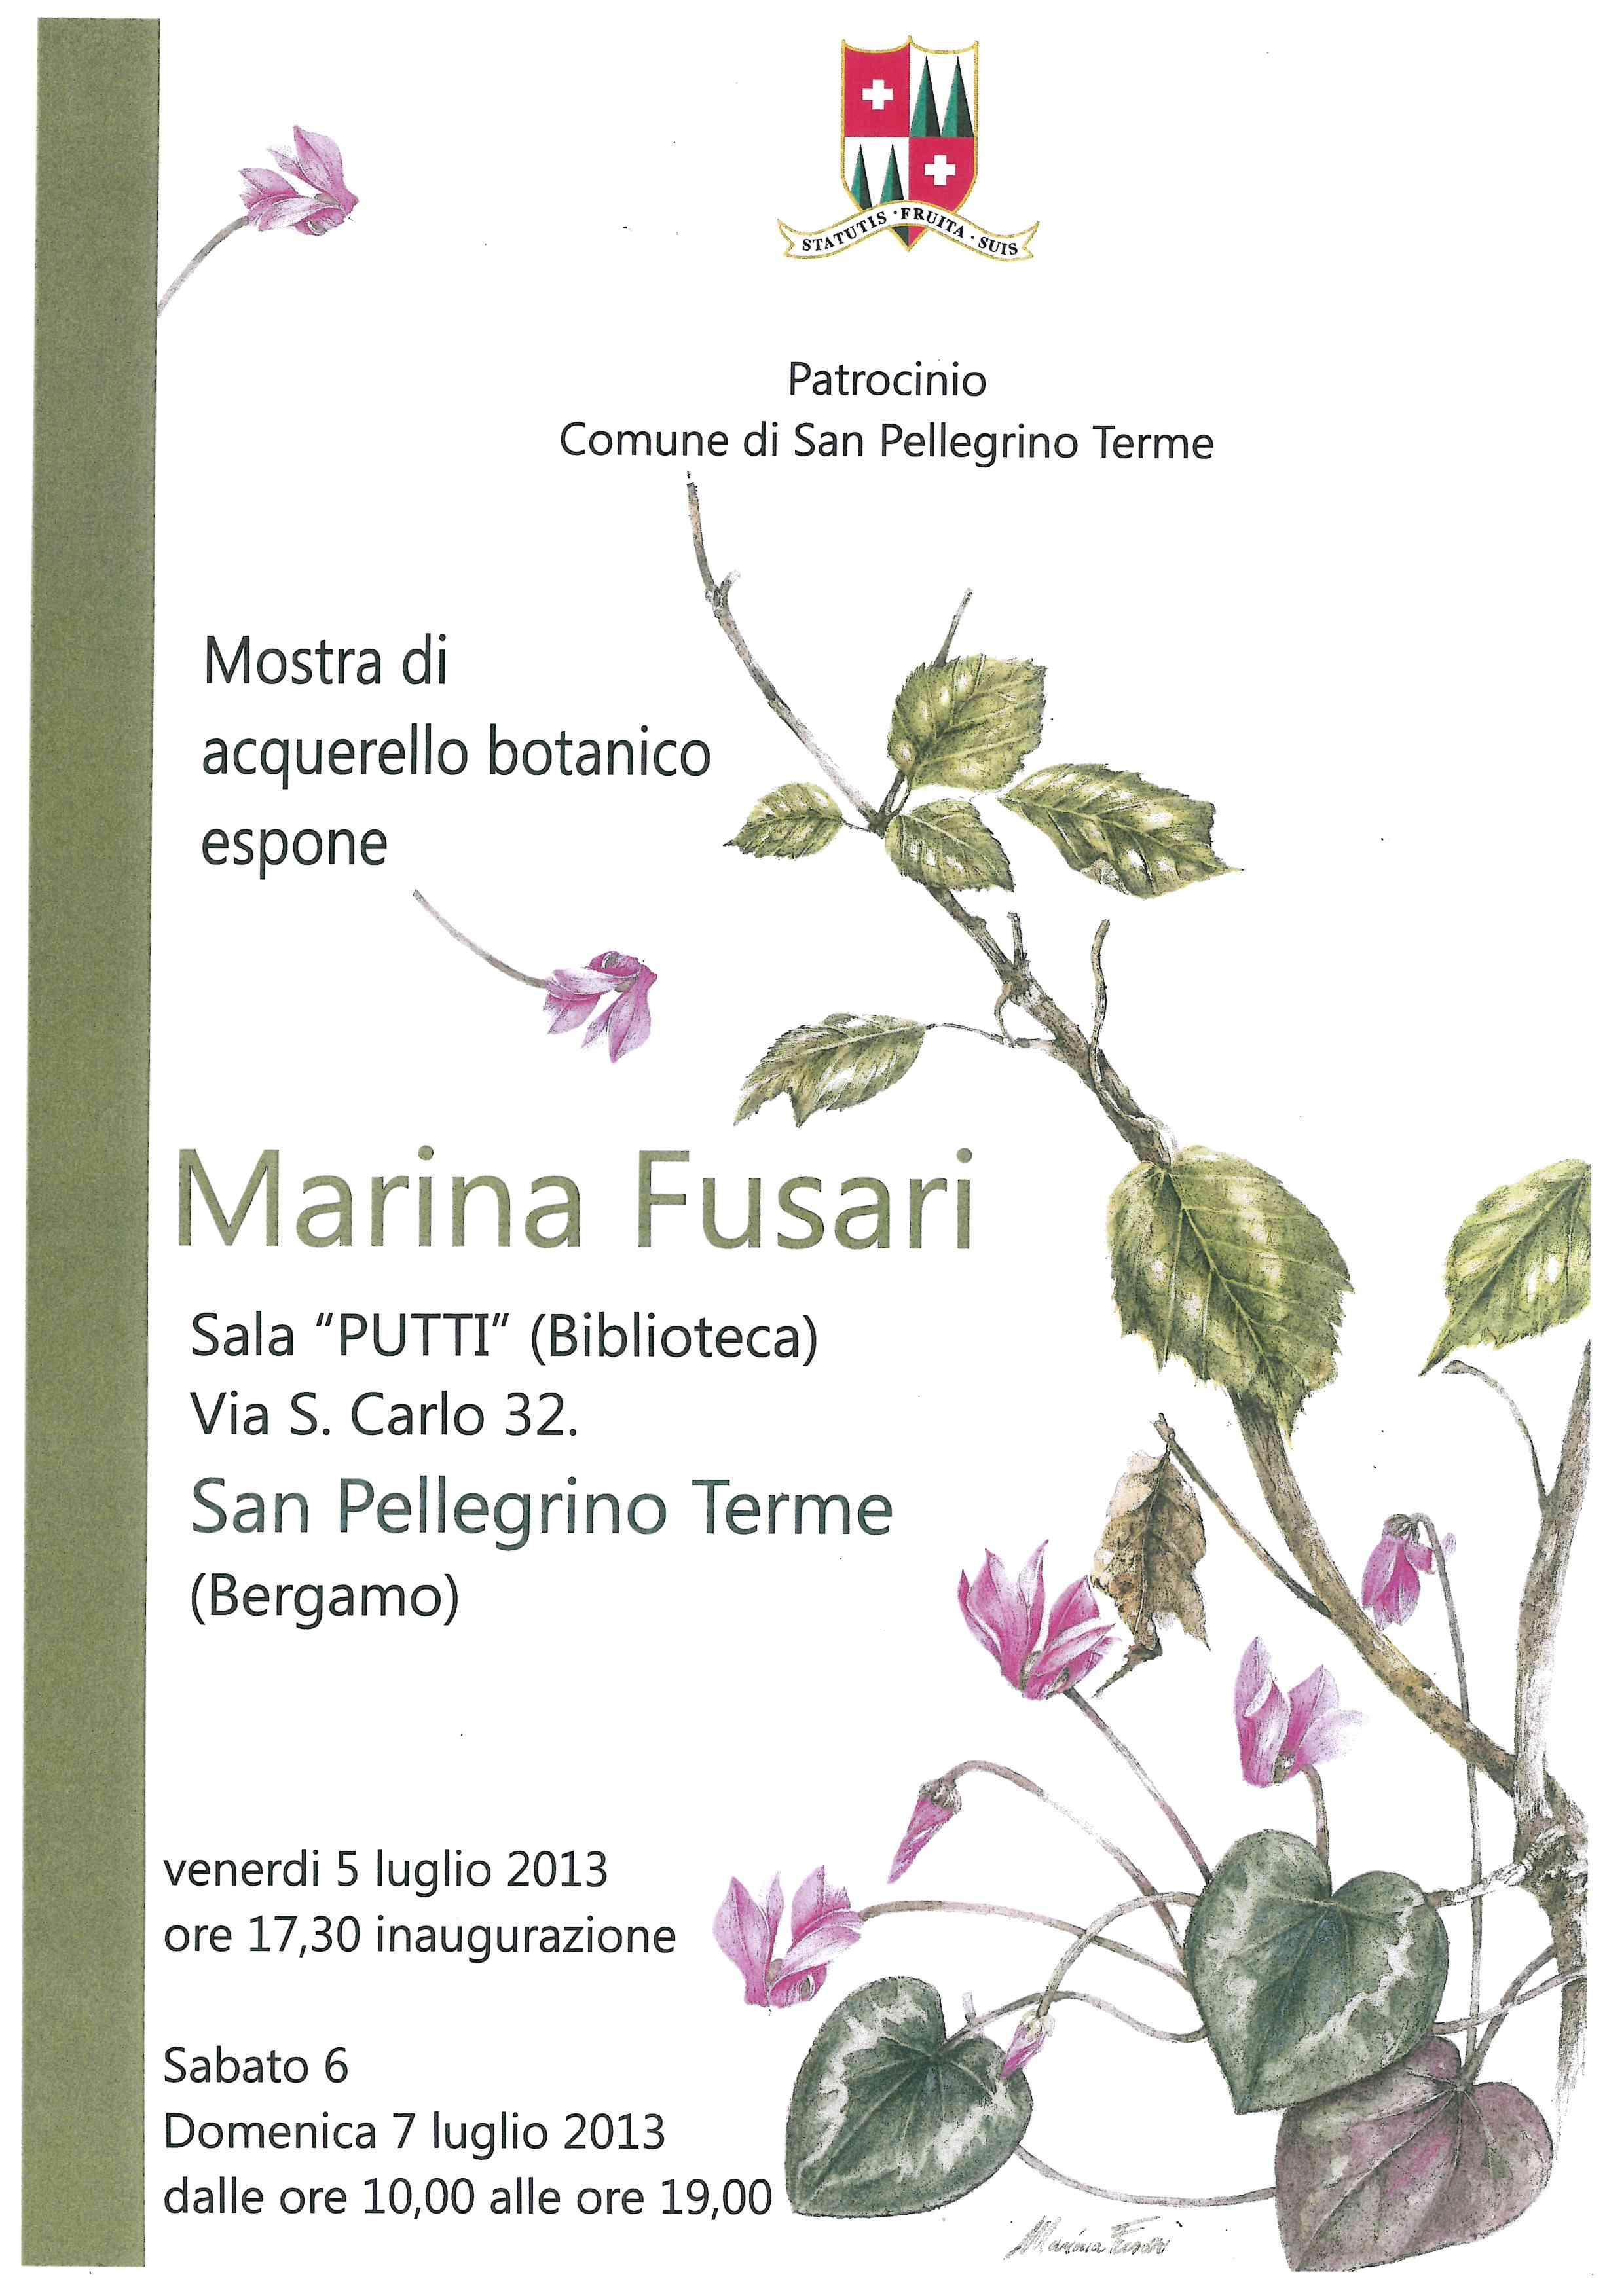 Marina Fusari - Mostra di acquerello botanico